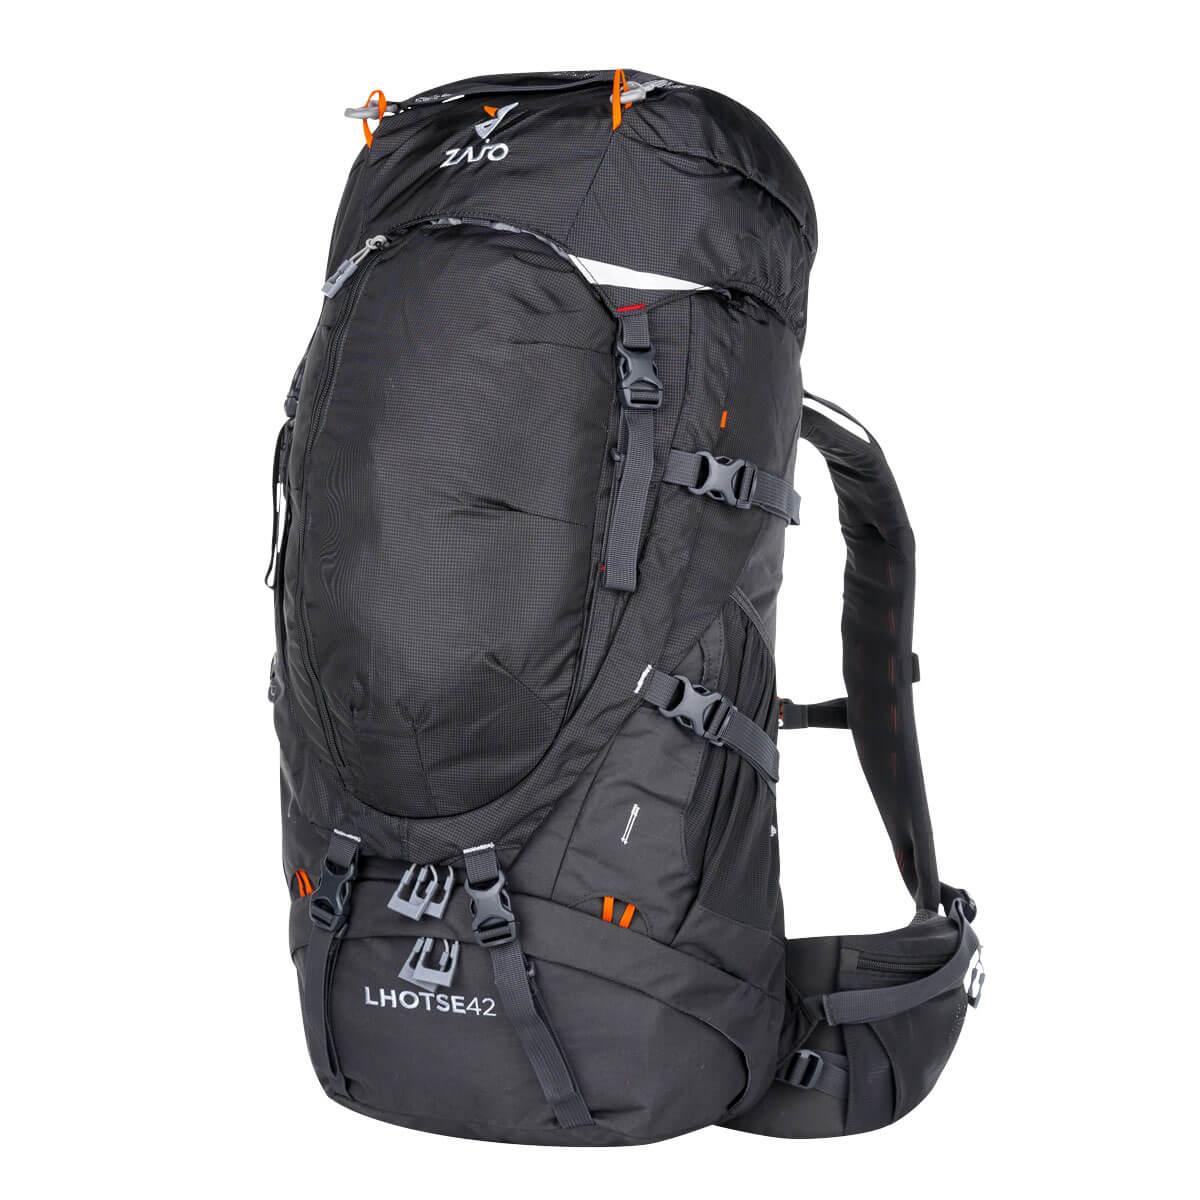 Batoh Zajo Lhotse 42 Backpack